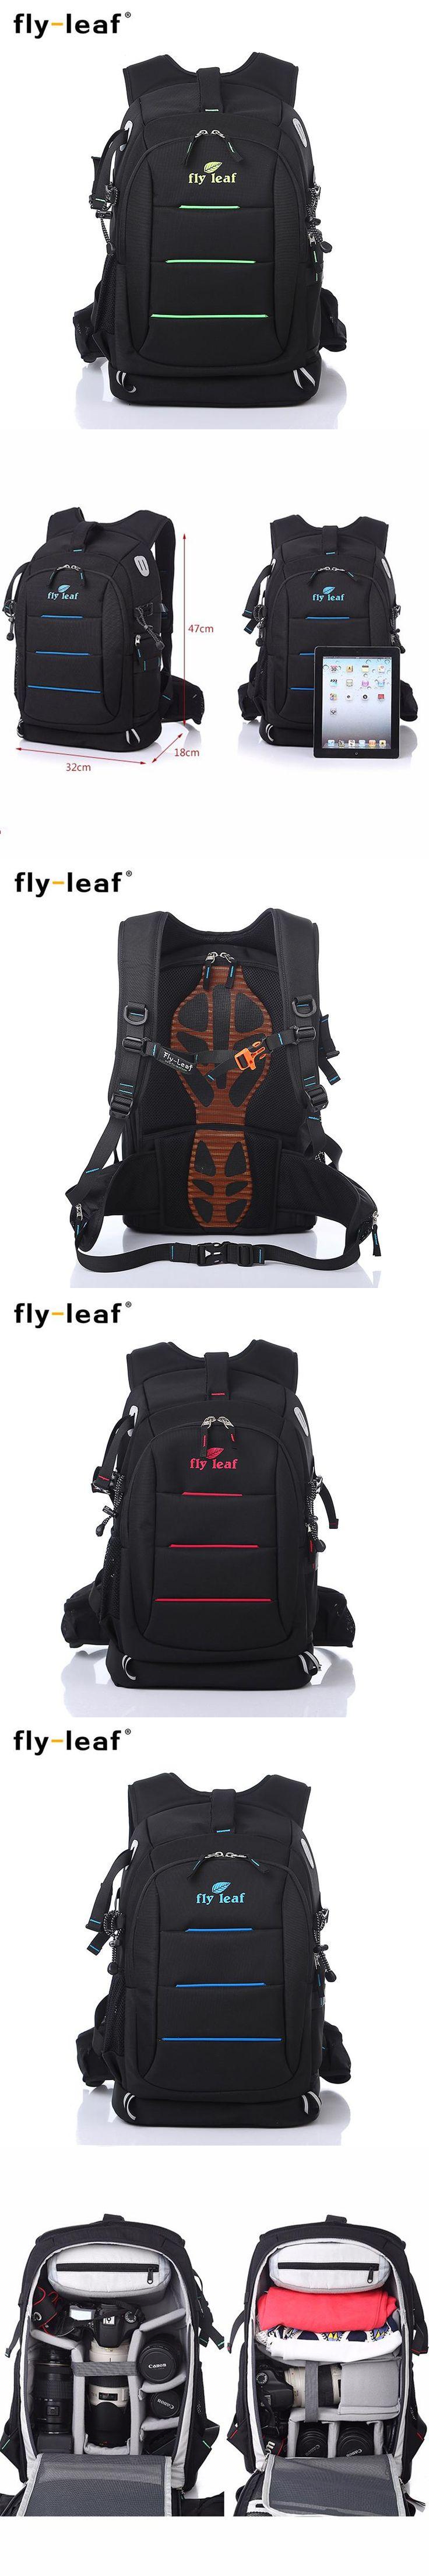 Fly-leaf FL 336 DSLR  Photo Bag Camera Backpack Universal  Large Capacity Travel Camera Backpack For Canon/Nikon Digital Camera